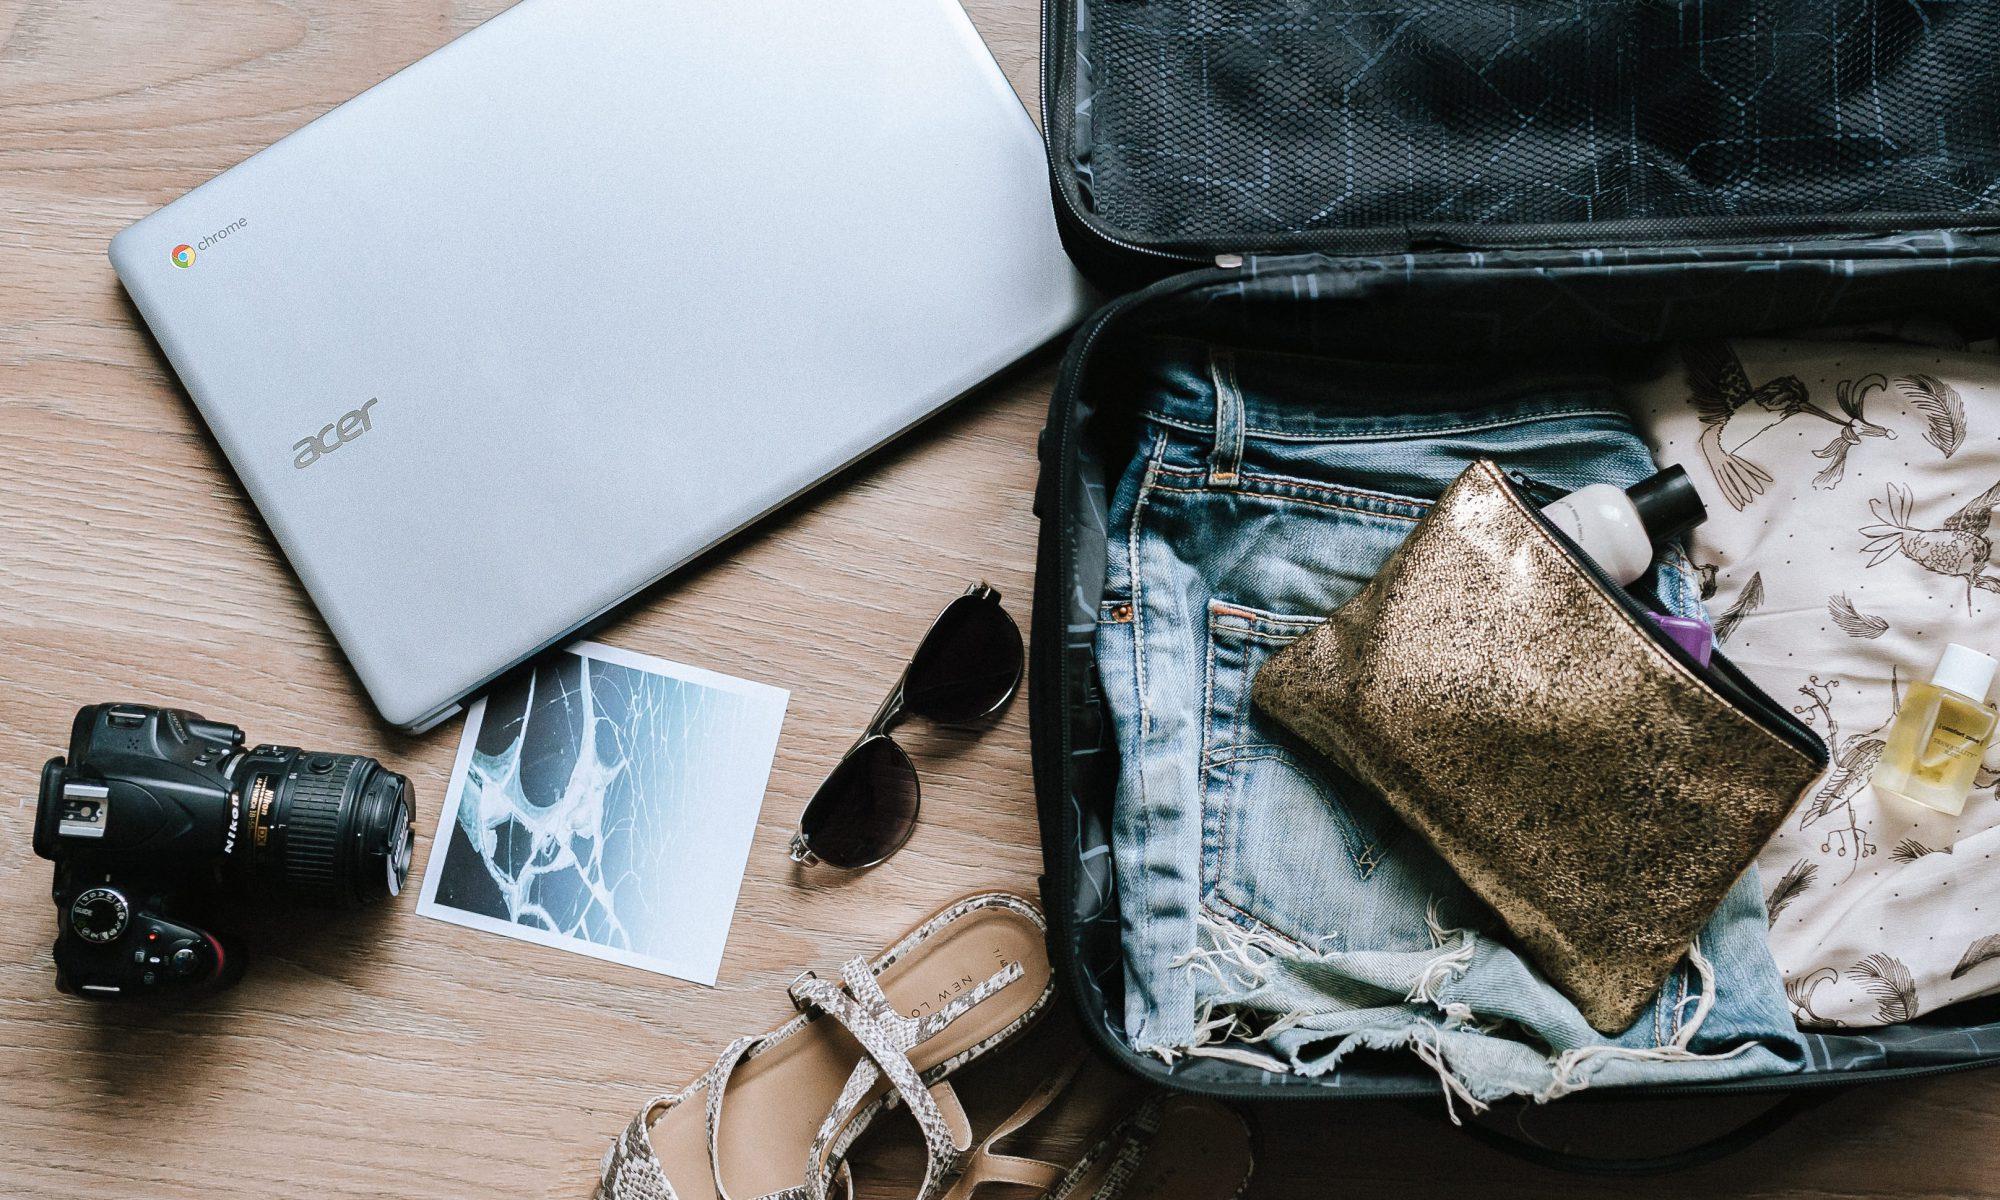 Travel and life magazine